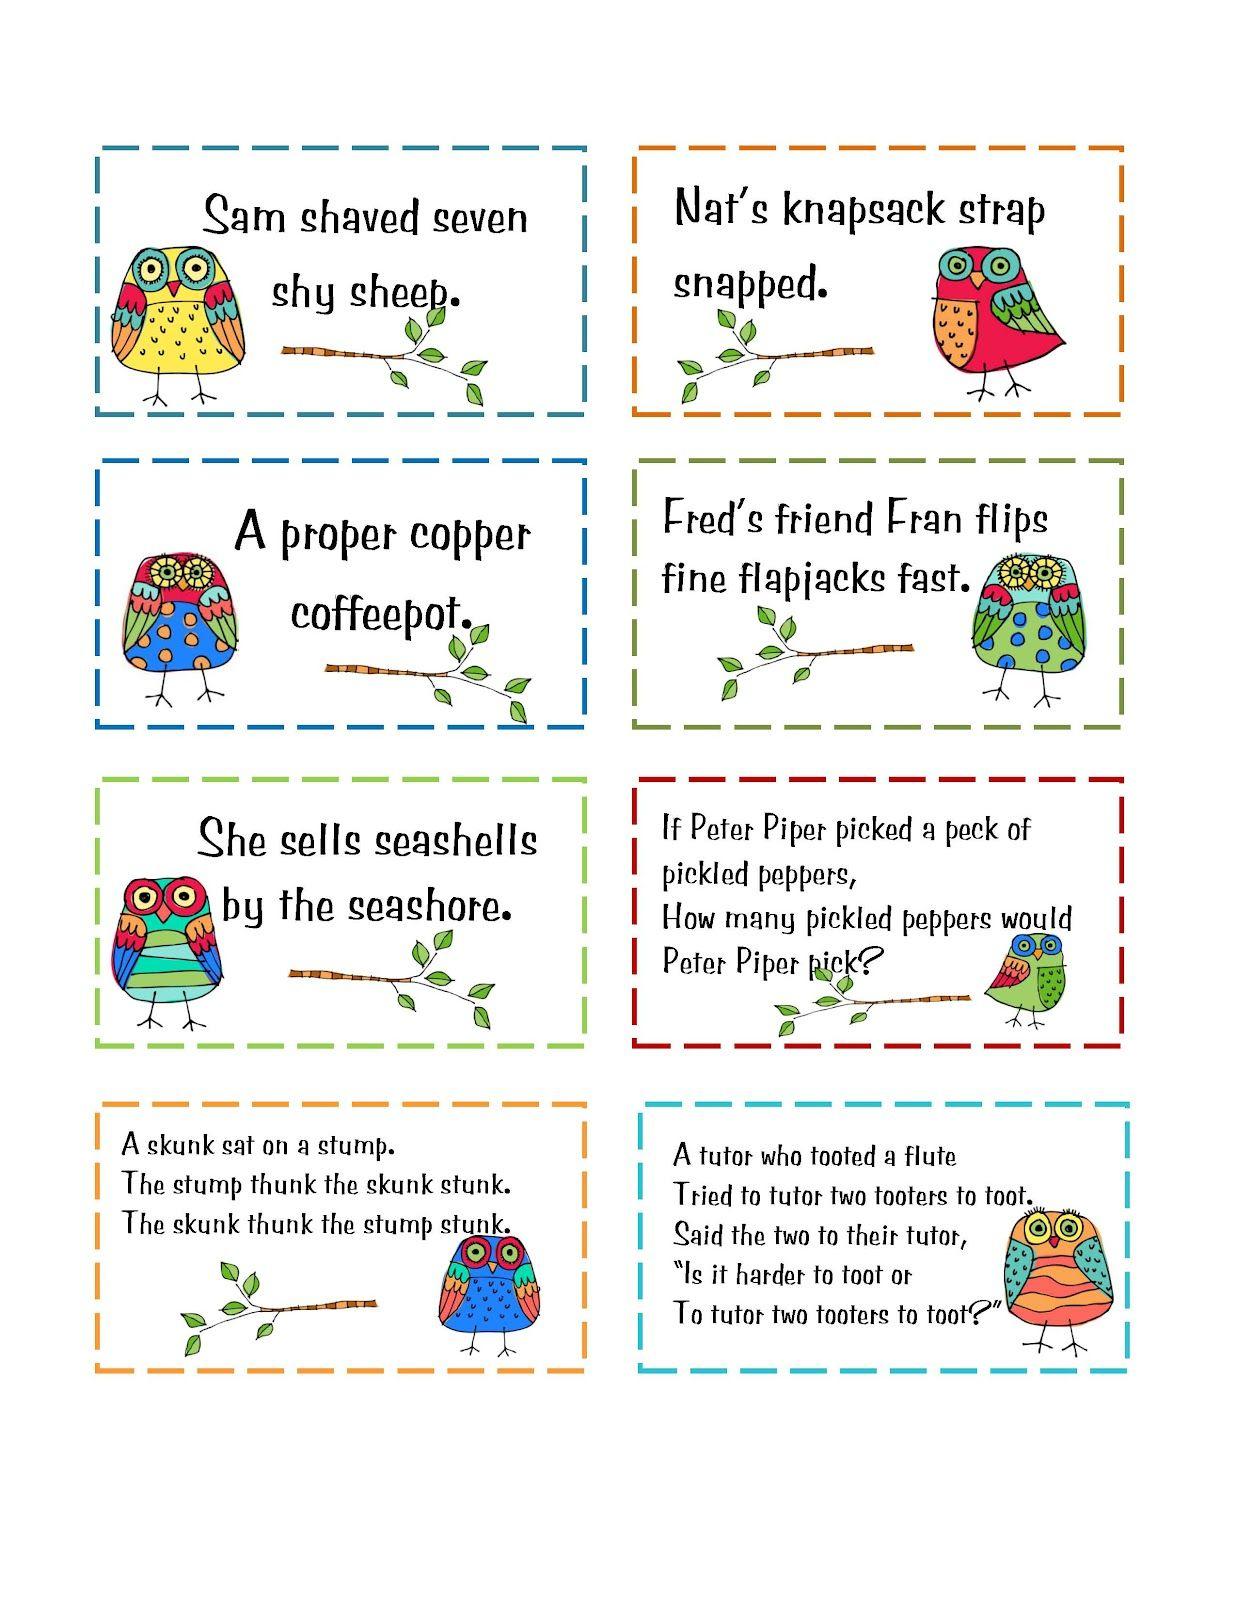 Preschool Printables: Freebie | School | Tongue Twisters For Kids - Free Printable Tongue Twisters